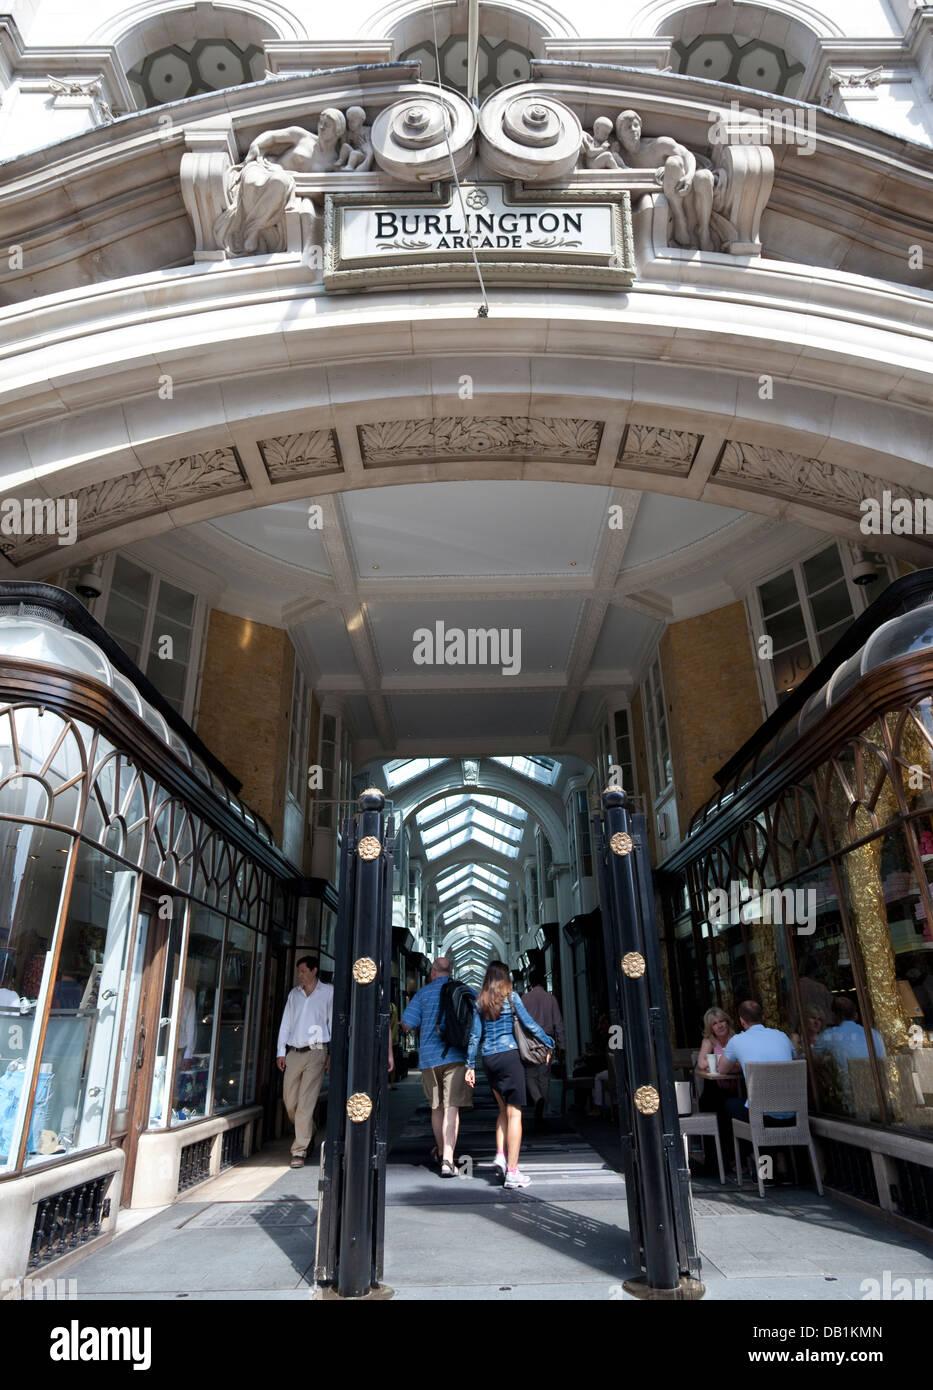 Burlington Arcade, Piccadilly, London - Stock Image